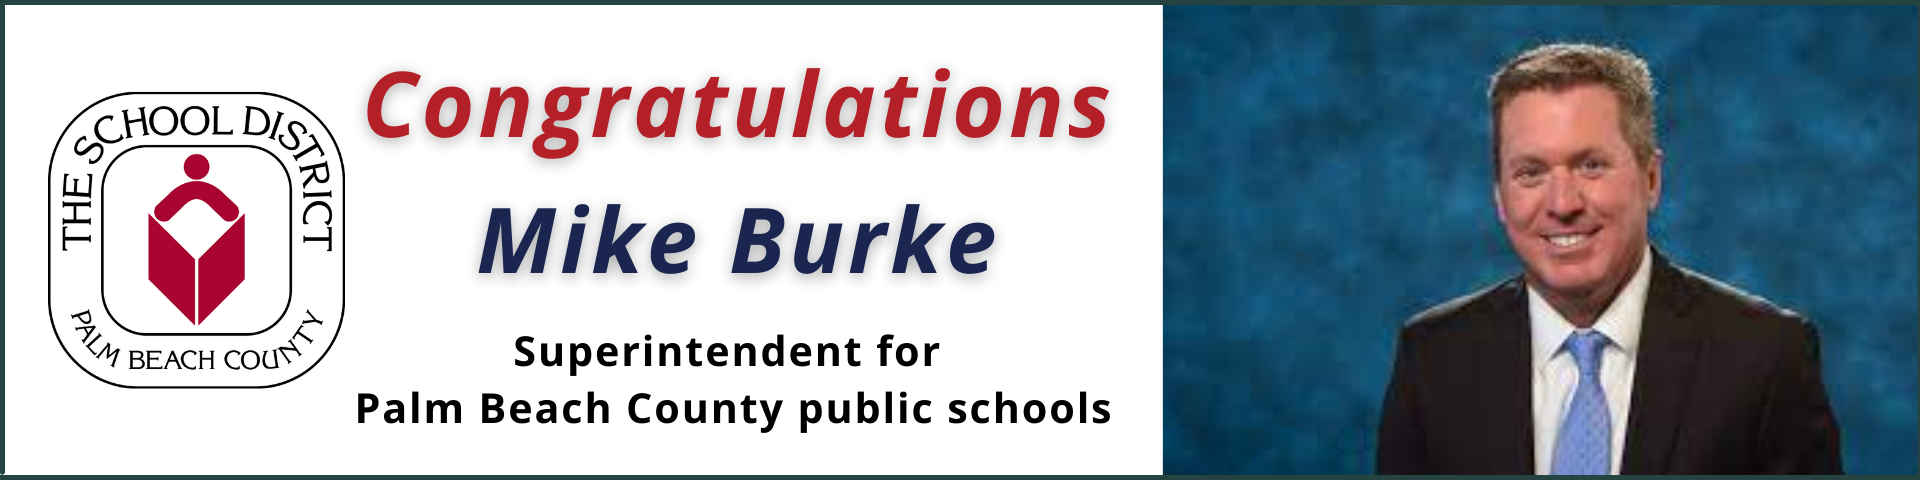 Congratulations to Mike Burke, Interim Superintendent for PBC public schools